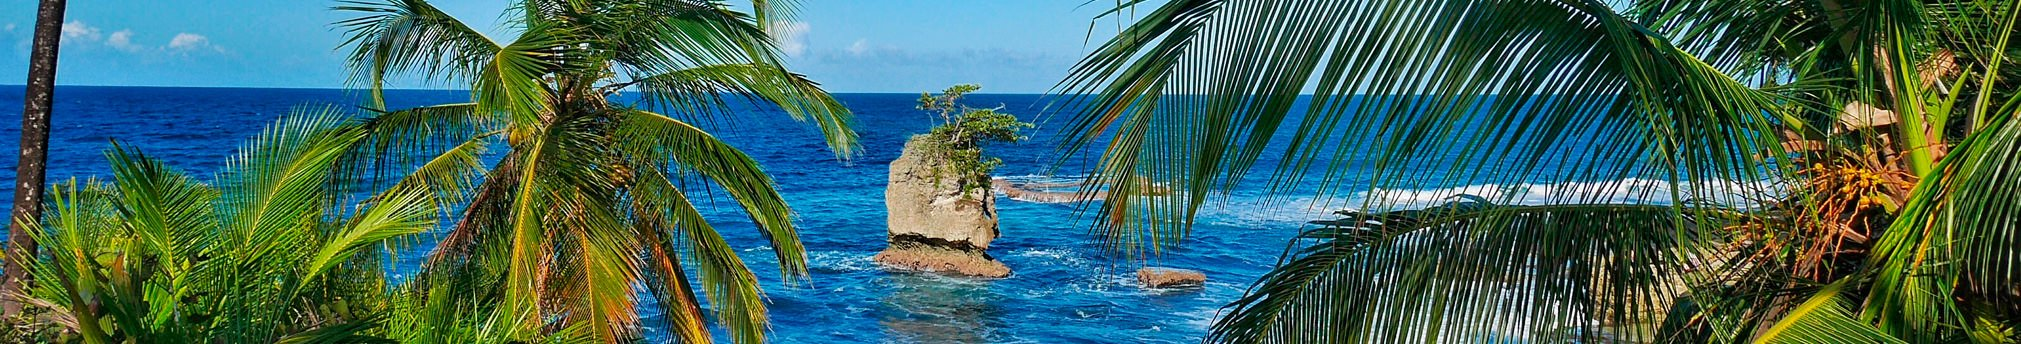 Puerto Viejo Hotels